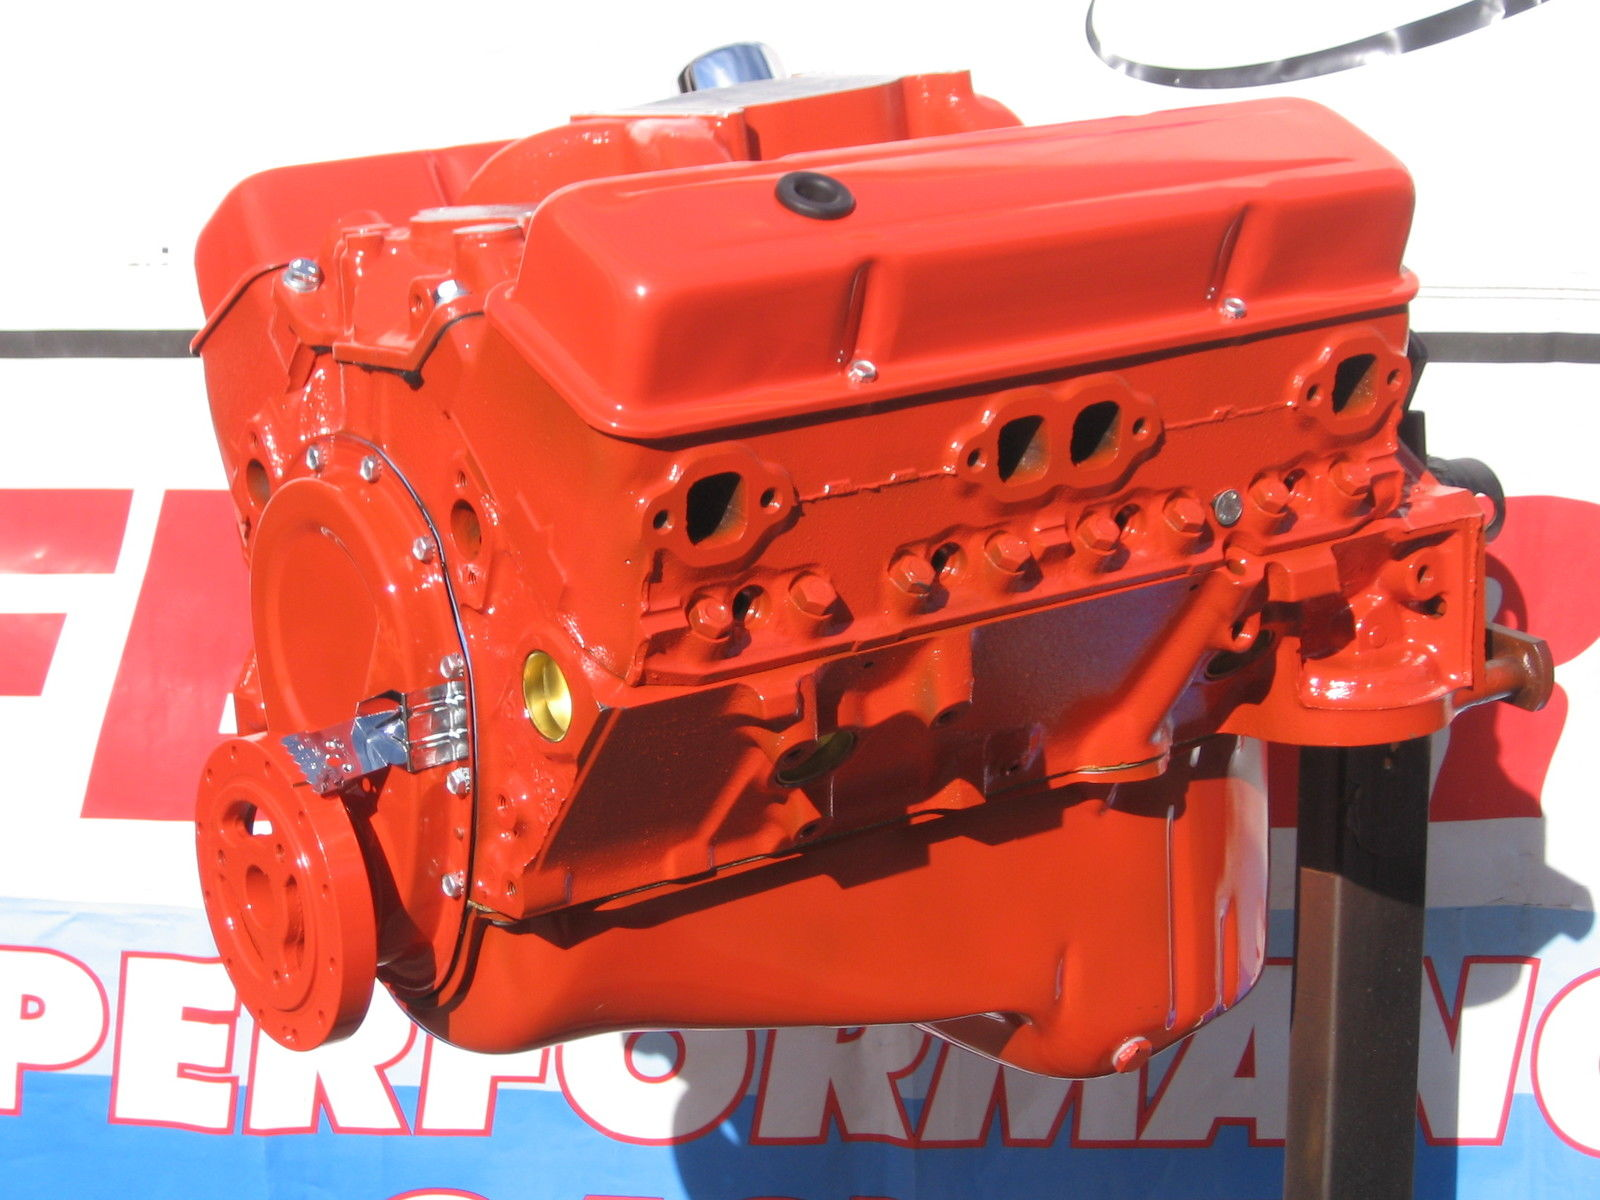 Chevy 283 / 280 HP High Performance Balanced Crate Engine ...